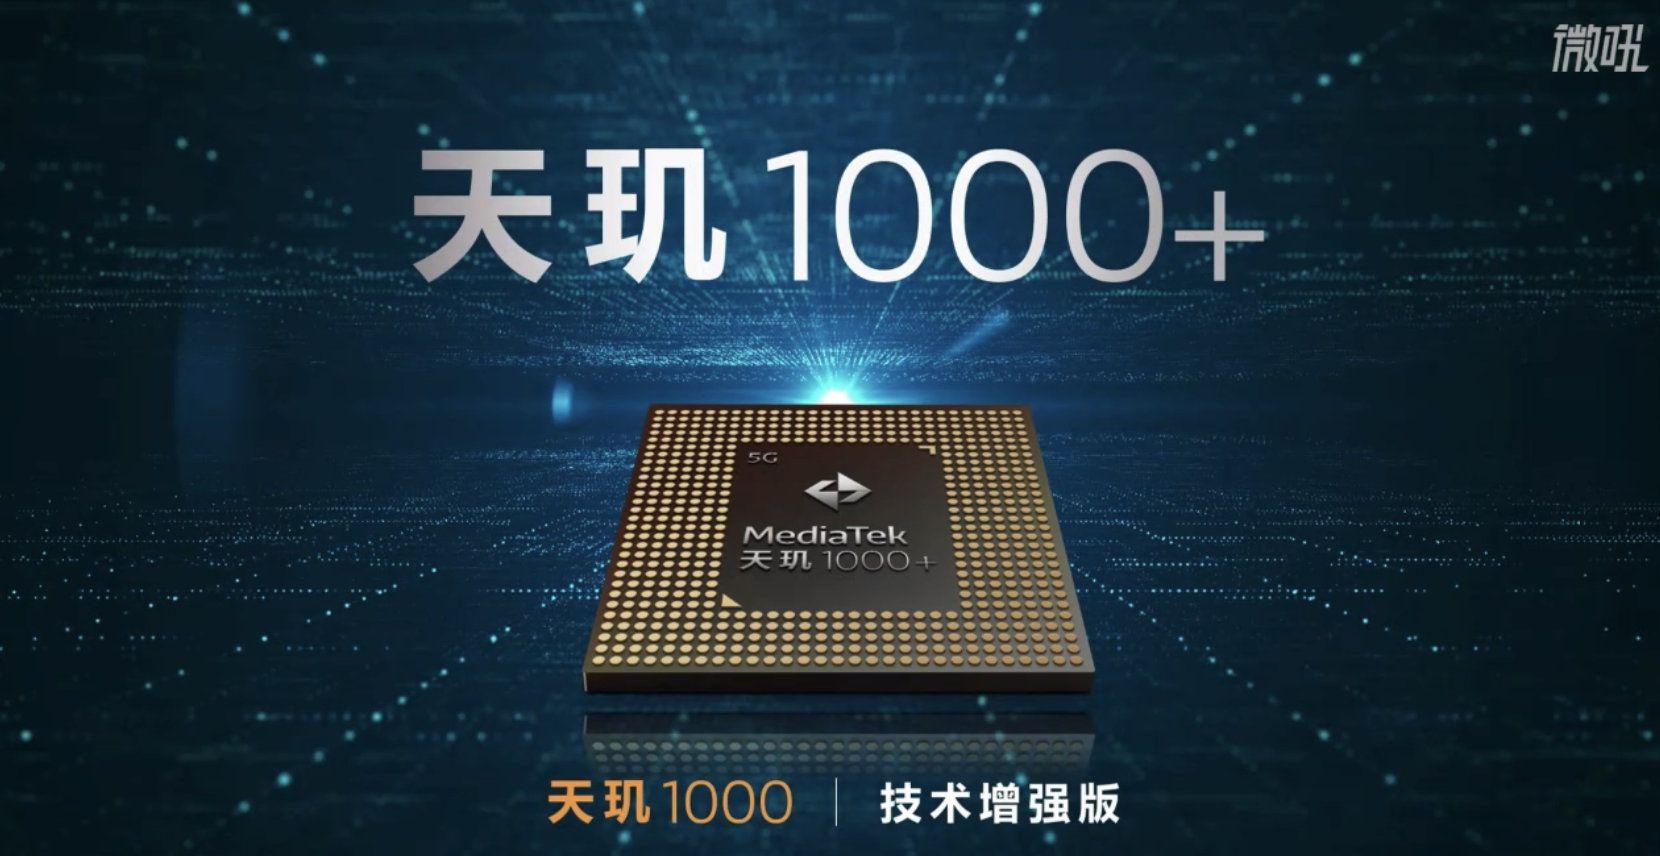 MediaTekは5G通信に対応したMediaTek Dimensity 1000+を発表、vivo iQOOが初採用